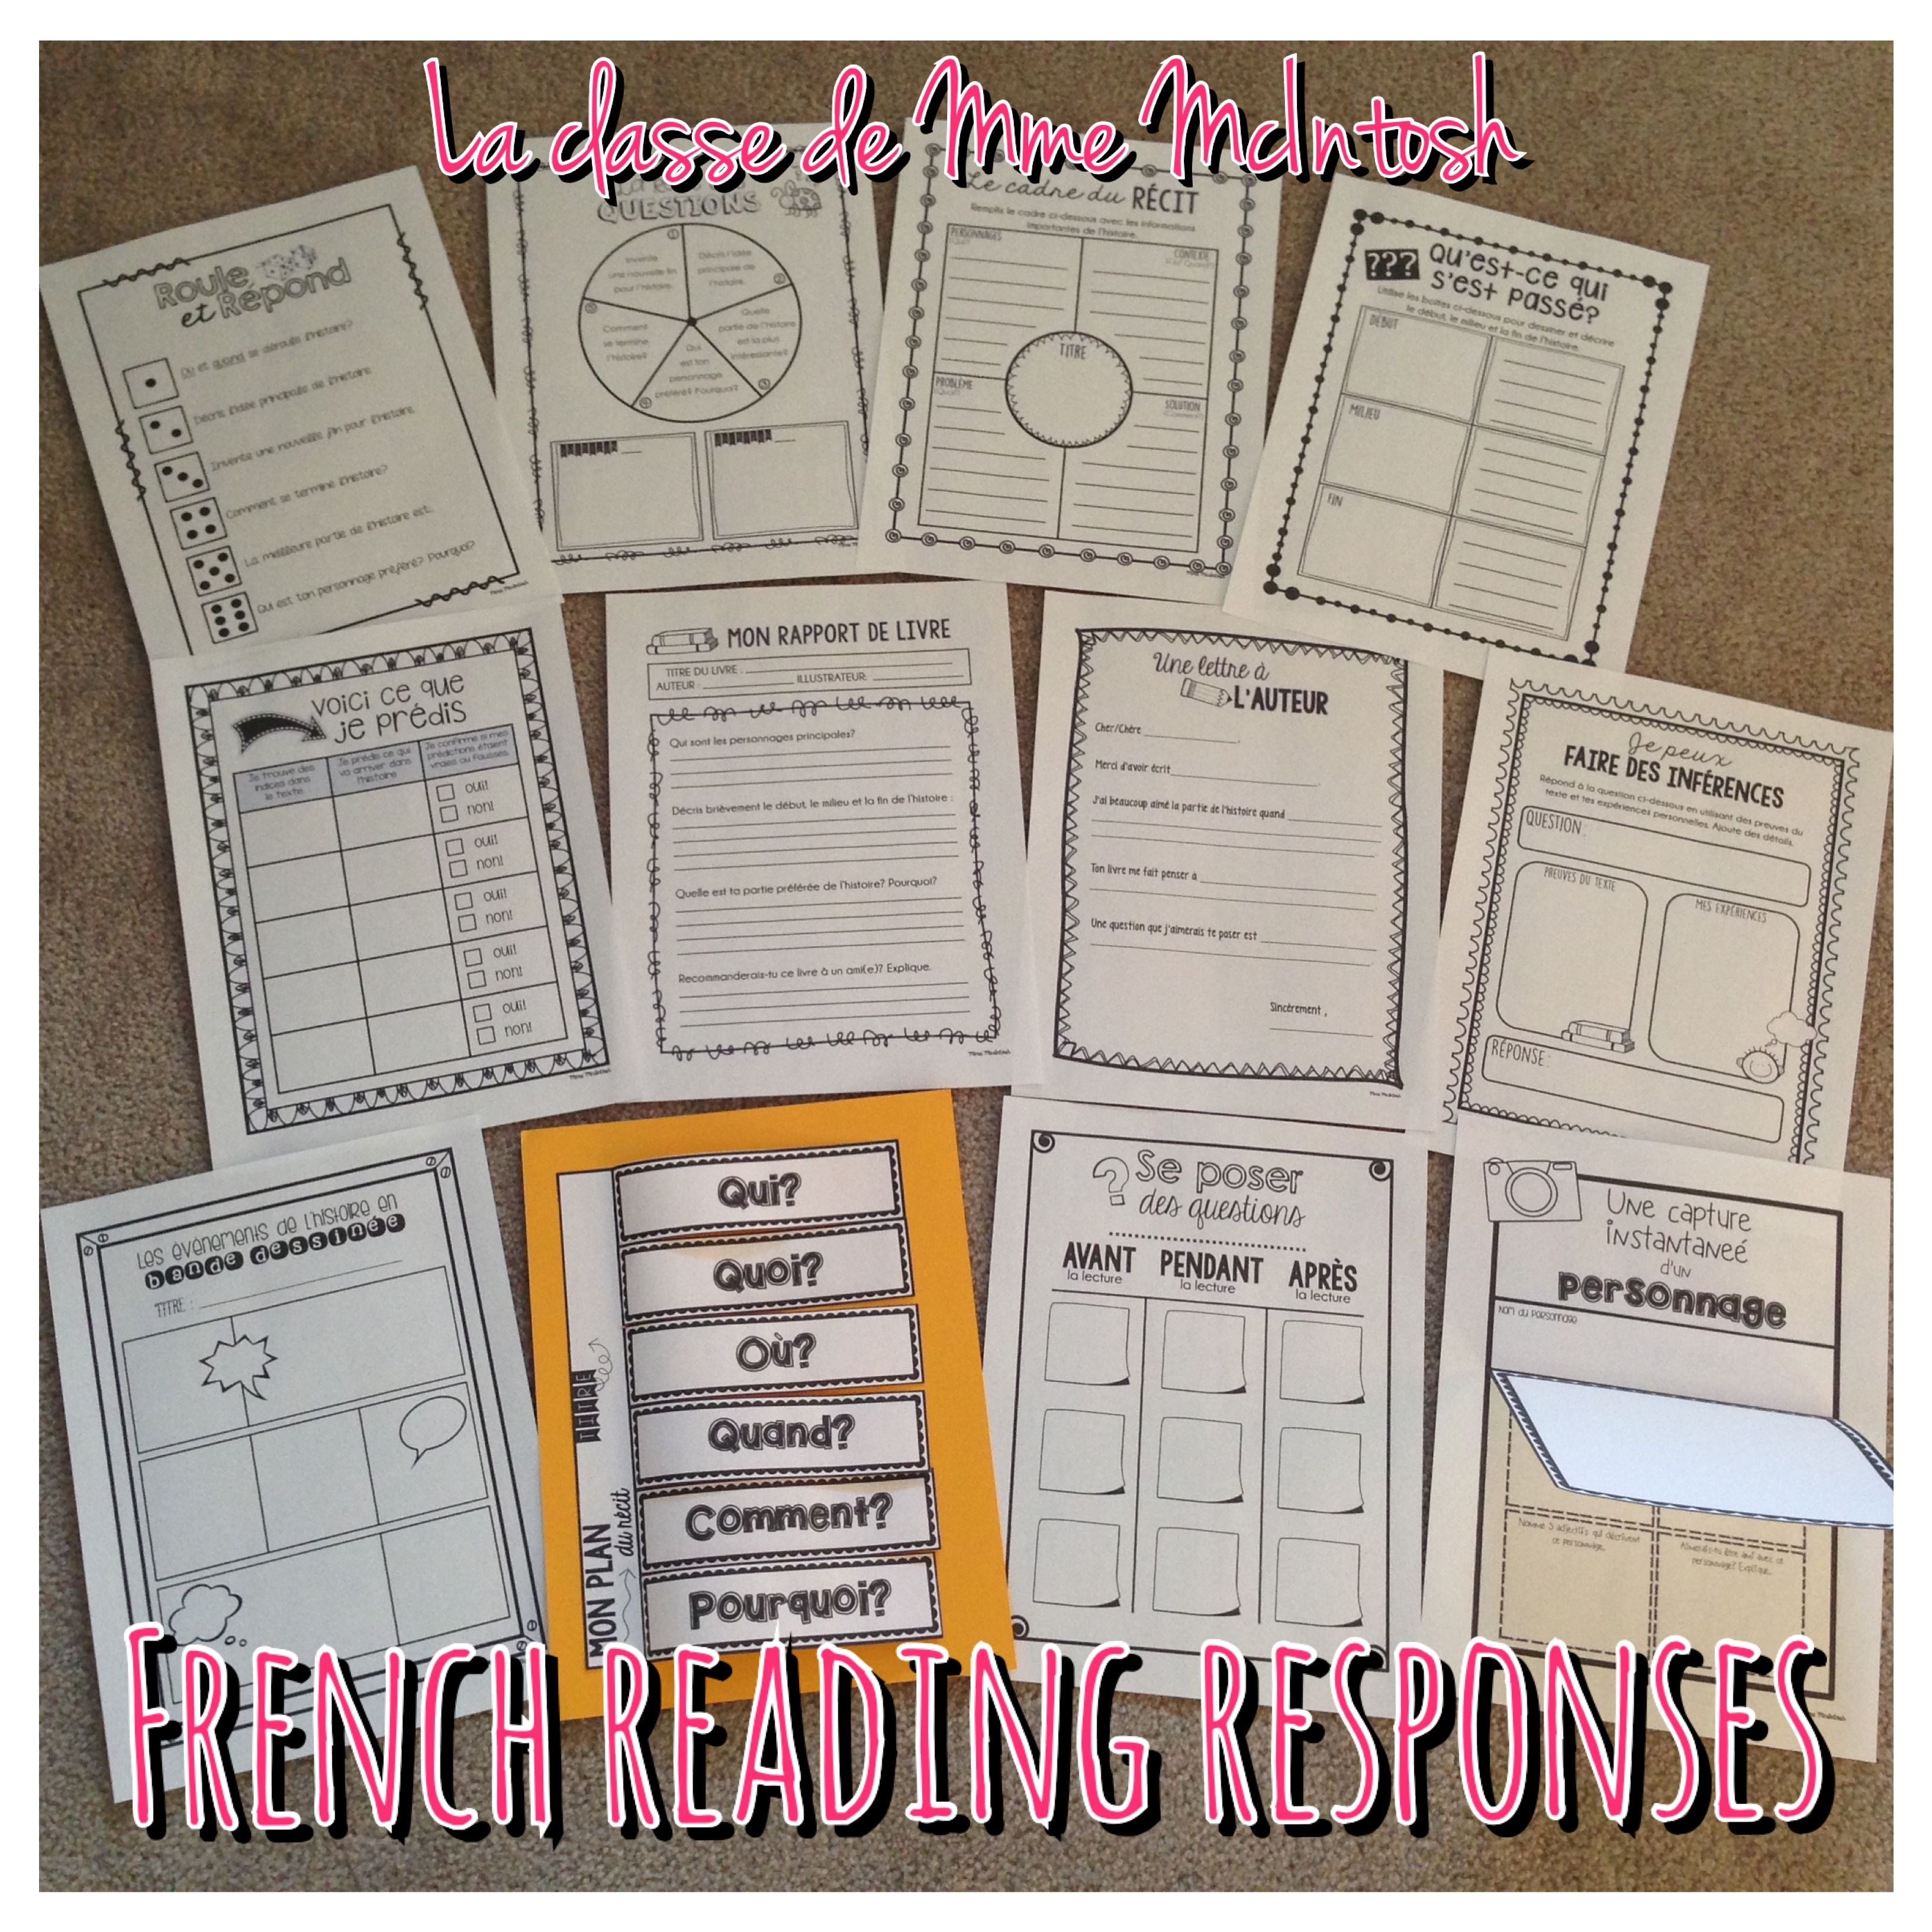 12 activités de compréhension/12 French Reading Response activities    Teaching french [ 3264 x 3264 Pixel ]